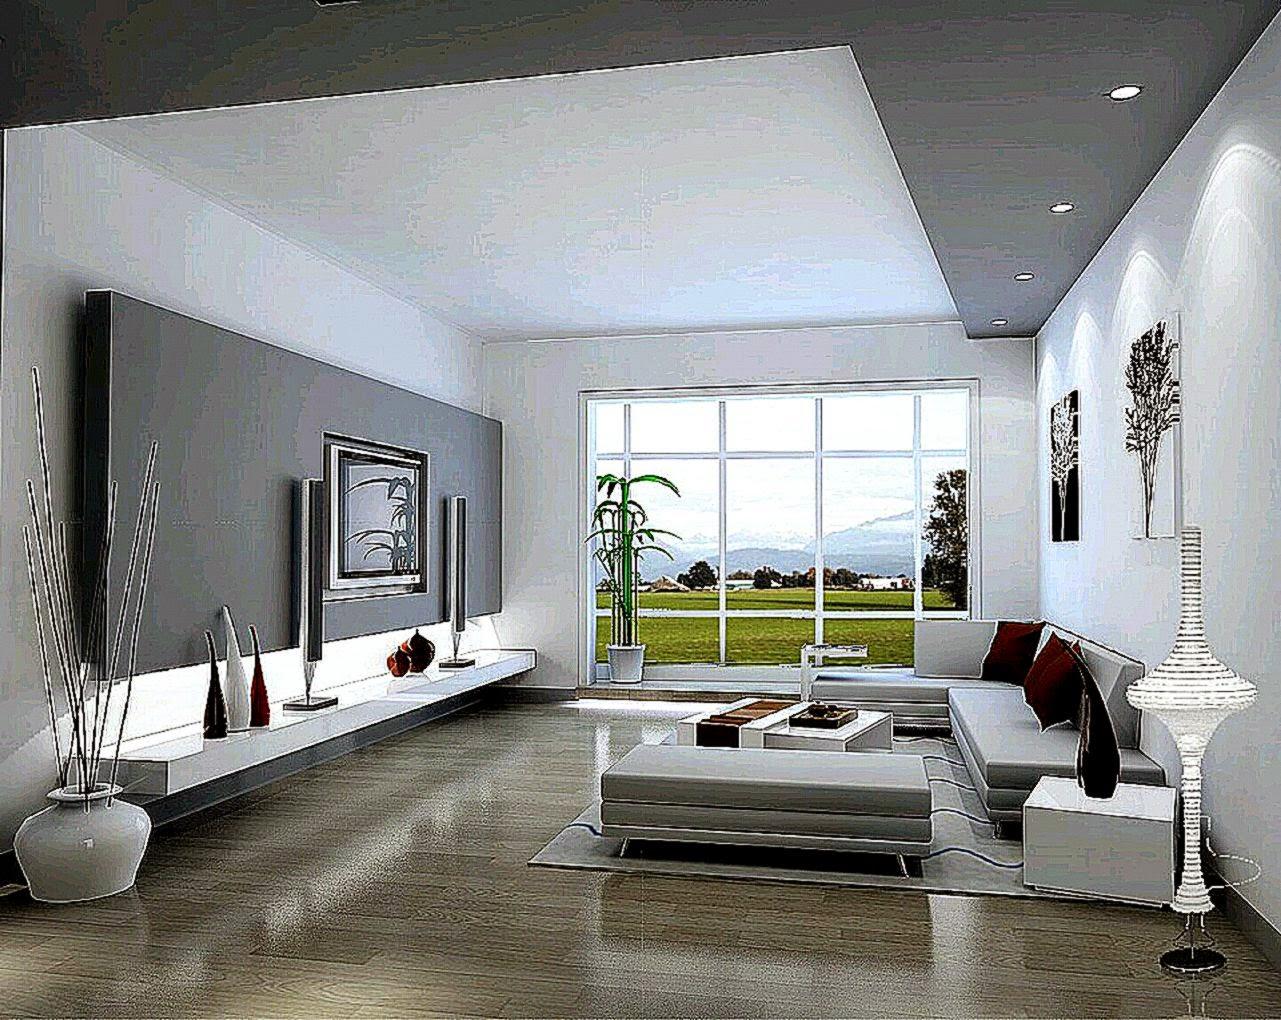 Gambar Interior Ruang Tamu Minimalis Modern Sederhana 2014